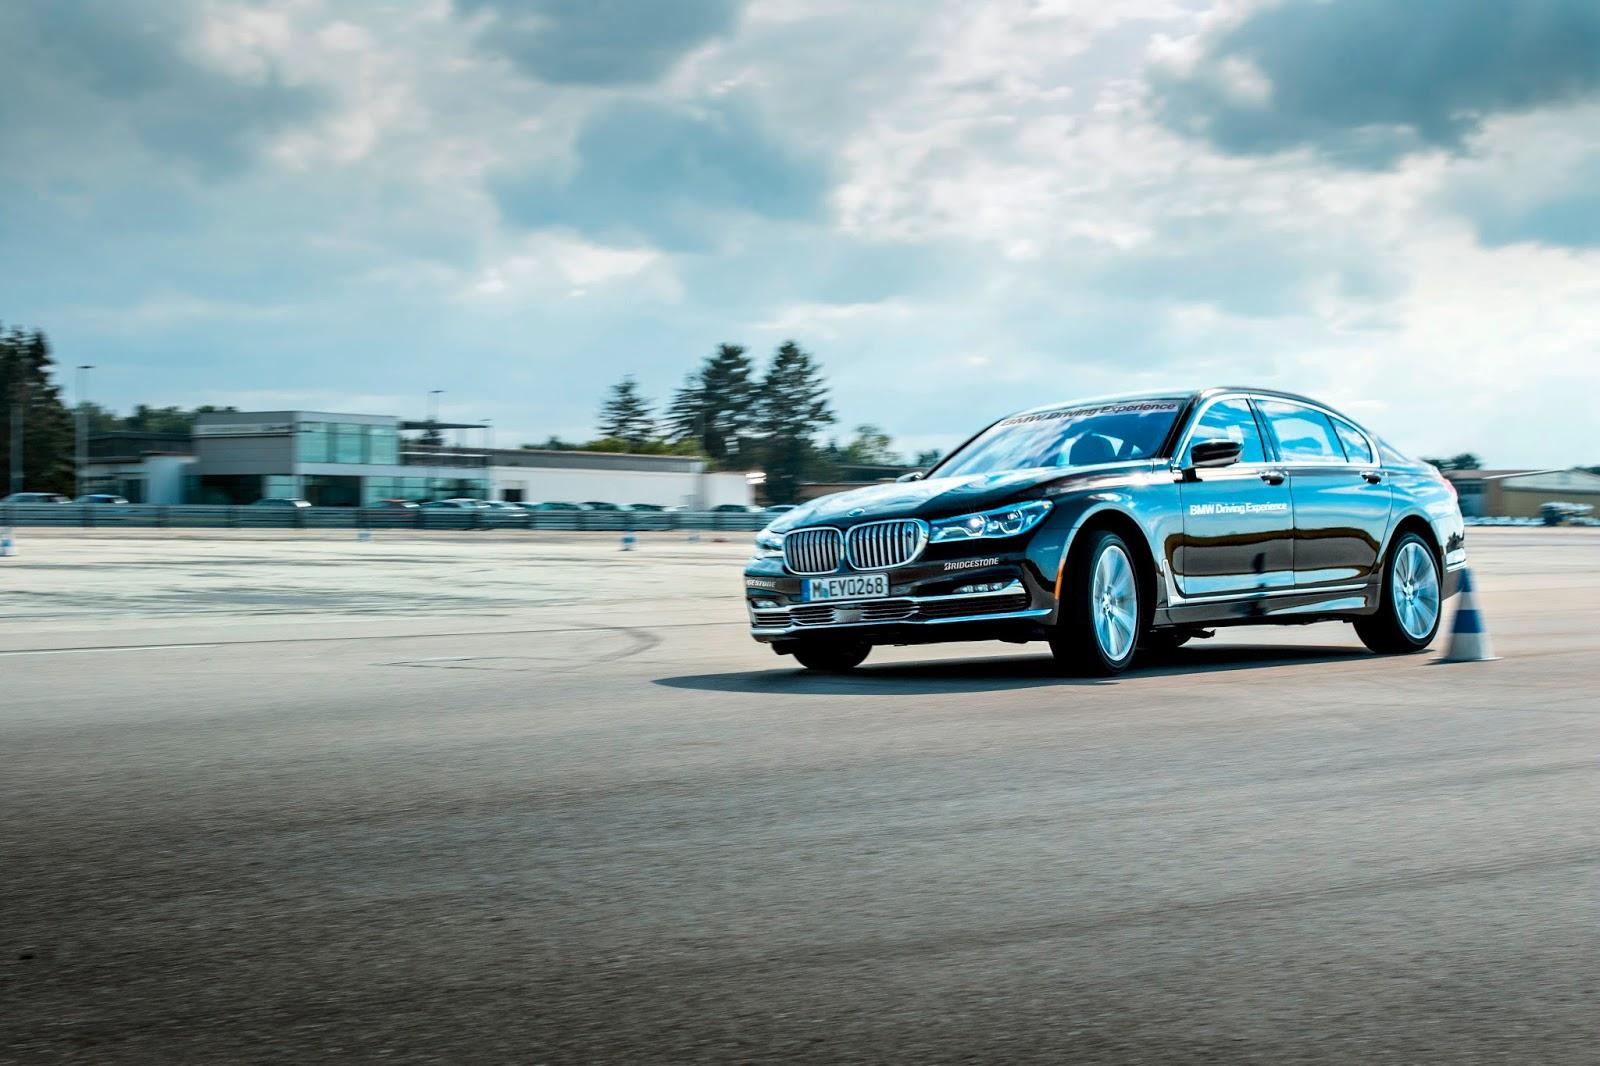 P90254176 highRes bmw mini driving ex 1 Γίνε καλύτερος οδηγός κάτω από όλες τις συνθήκες, με Bmw και Mini BMW, BMW i, BMW M, Driver, Driving Skills, Safety, οδήγηση, οδηγοί